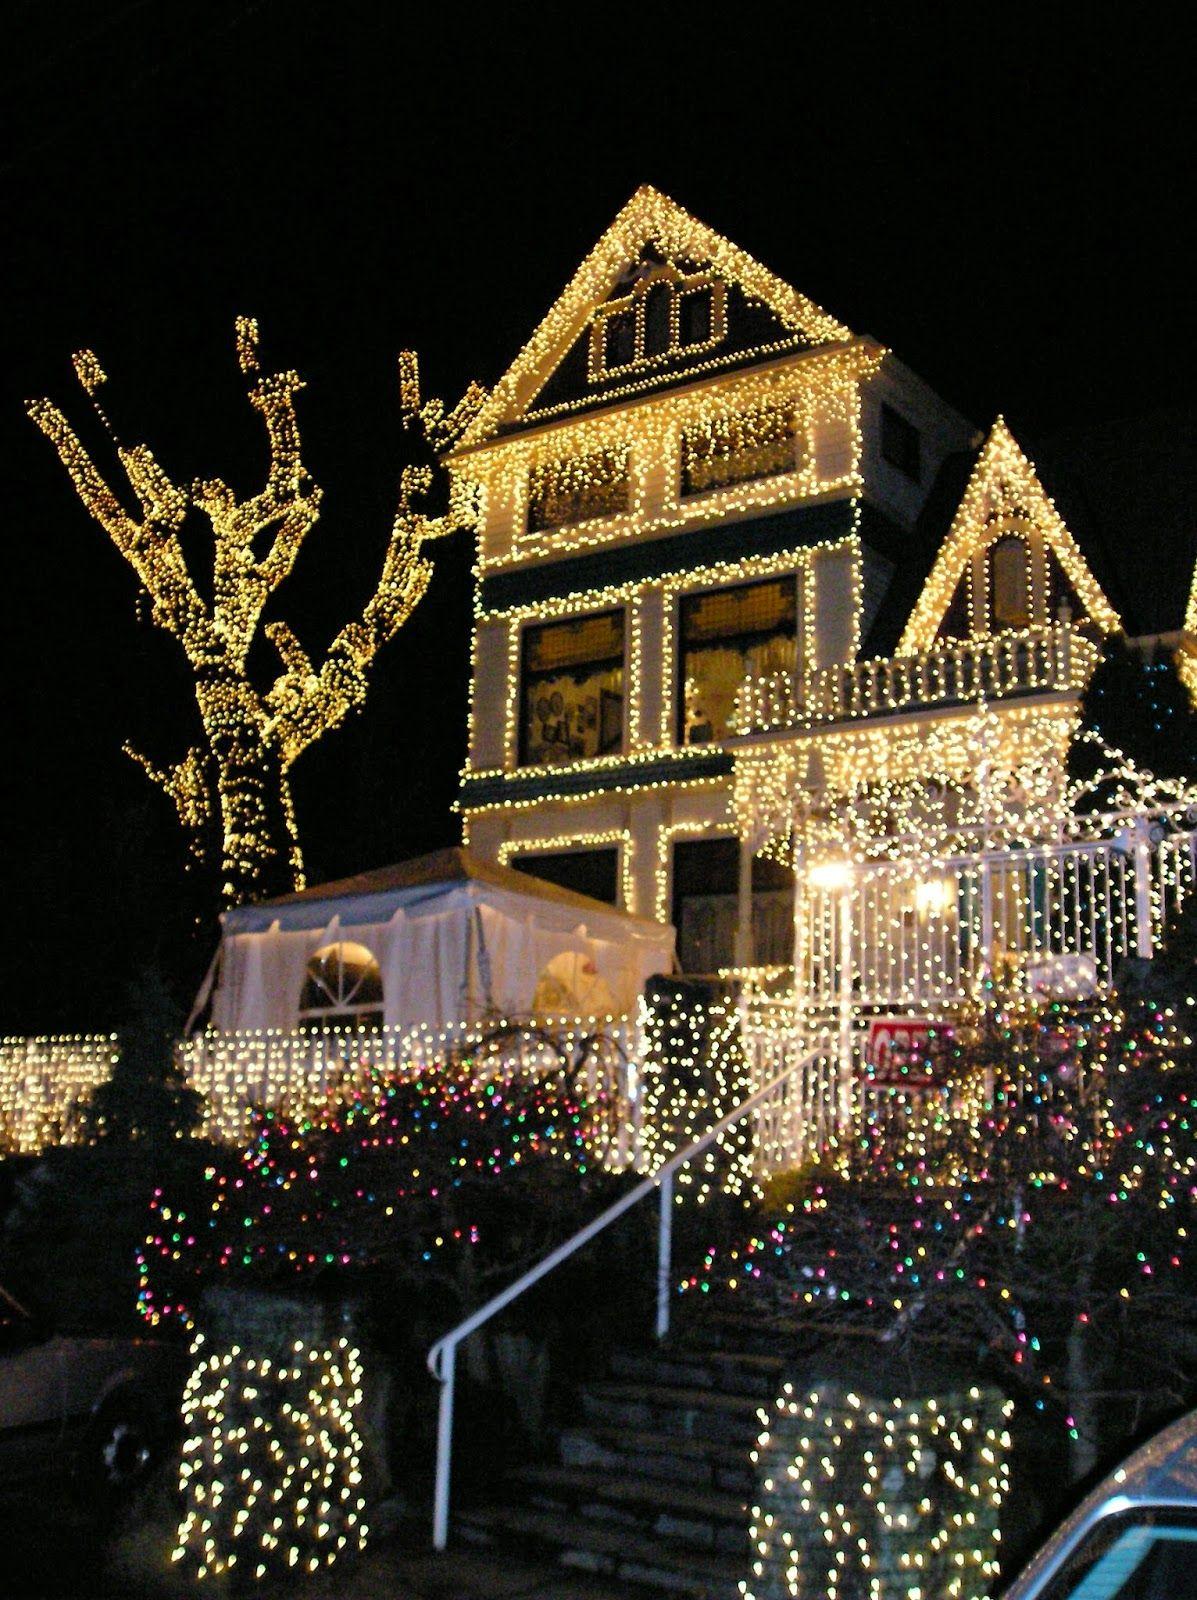 helen fern original photography christmas lights dat be nice link party